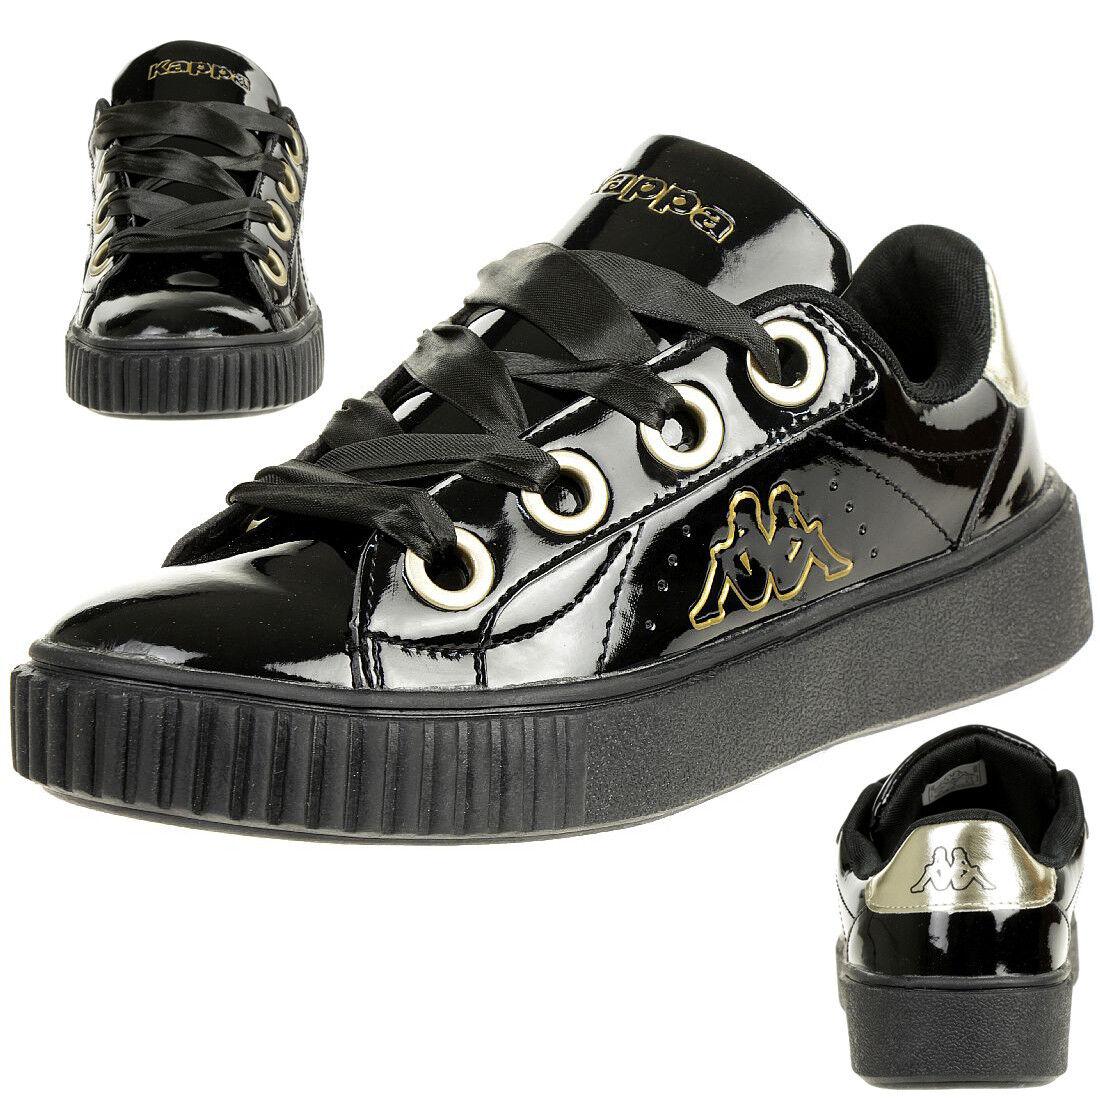 hot sale online 630f1 a6b00 Kappa Schuhe Damen Sneaker Test Vergleich +++ Kappa Schuhe ...